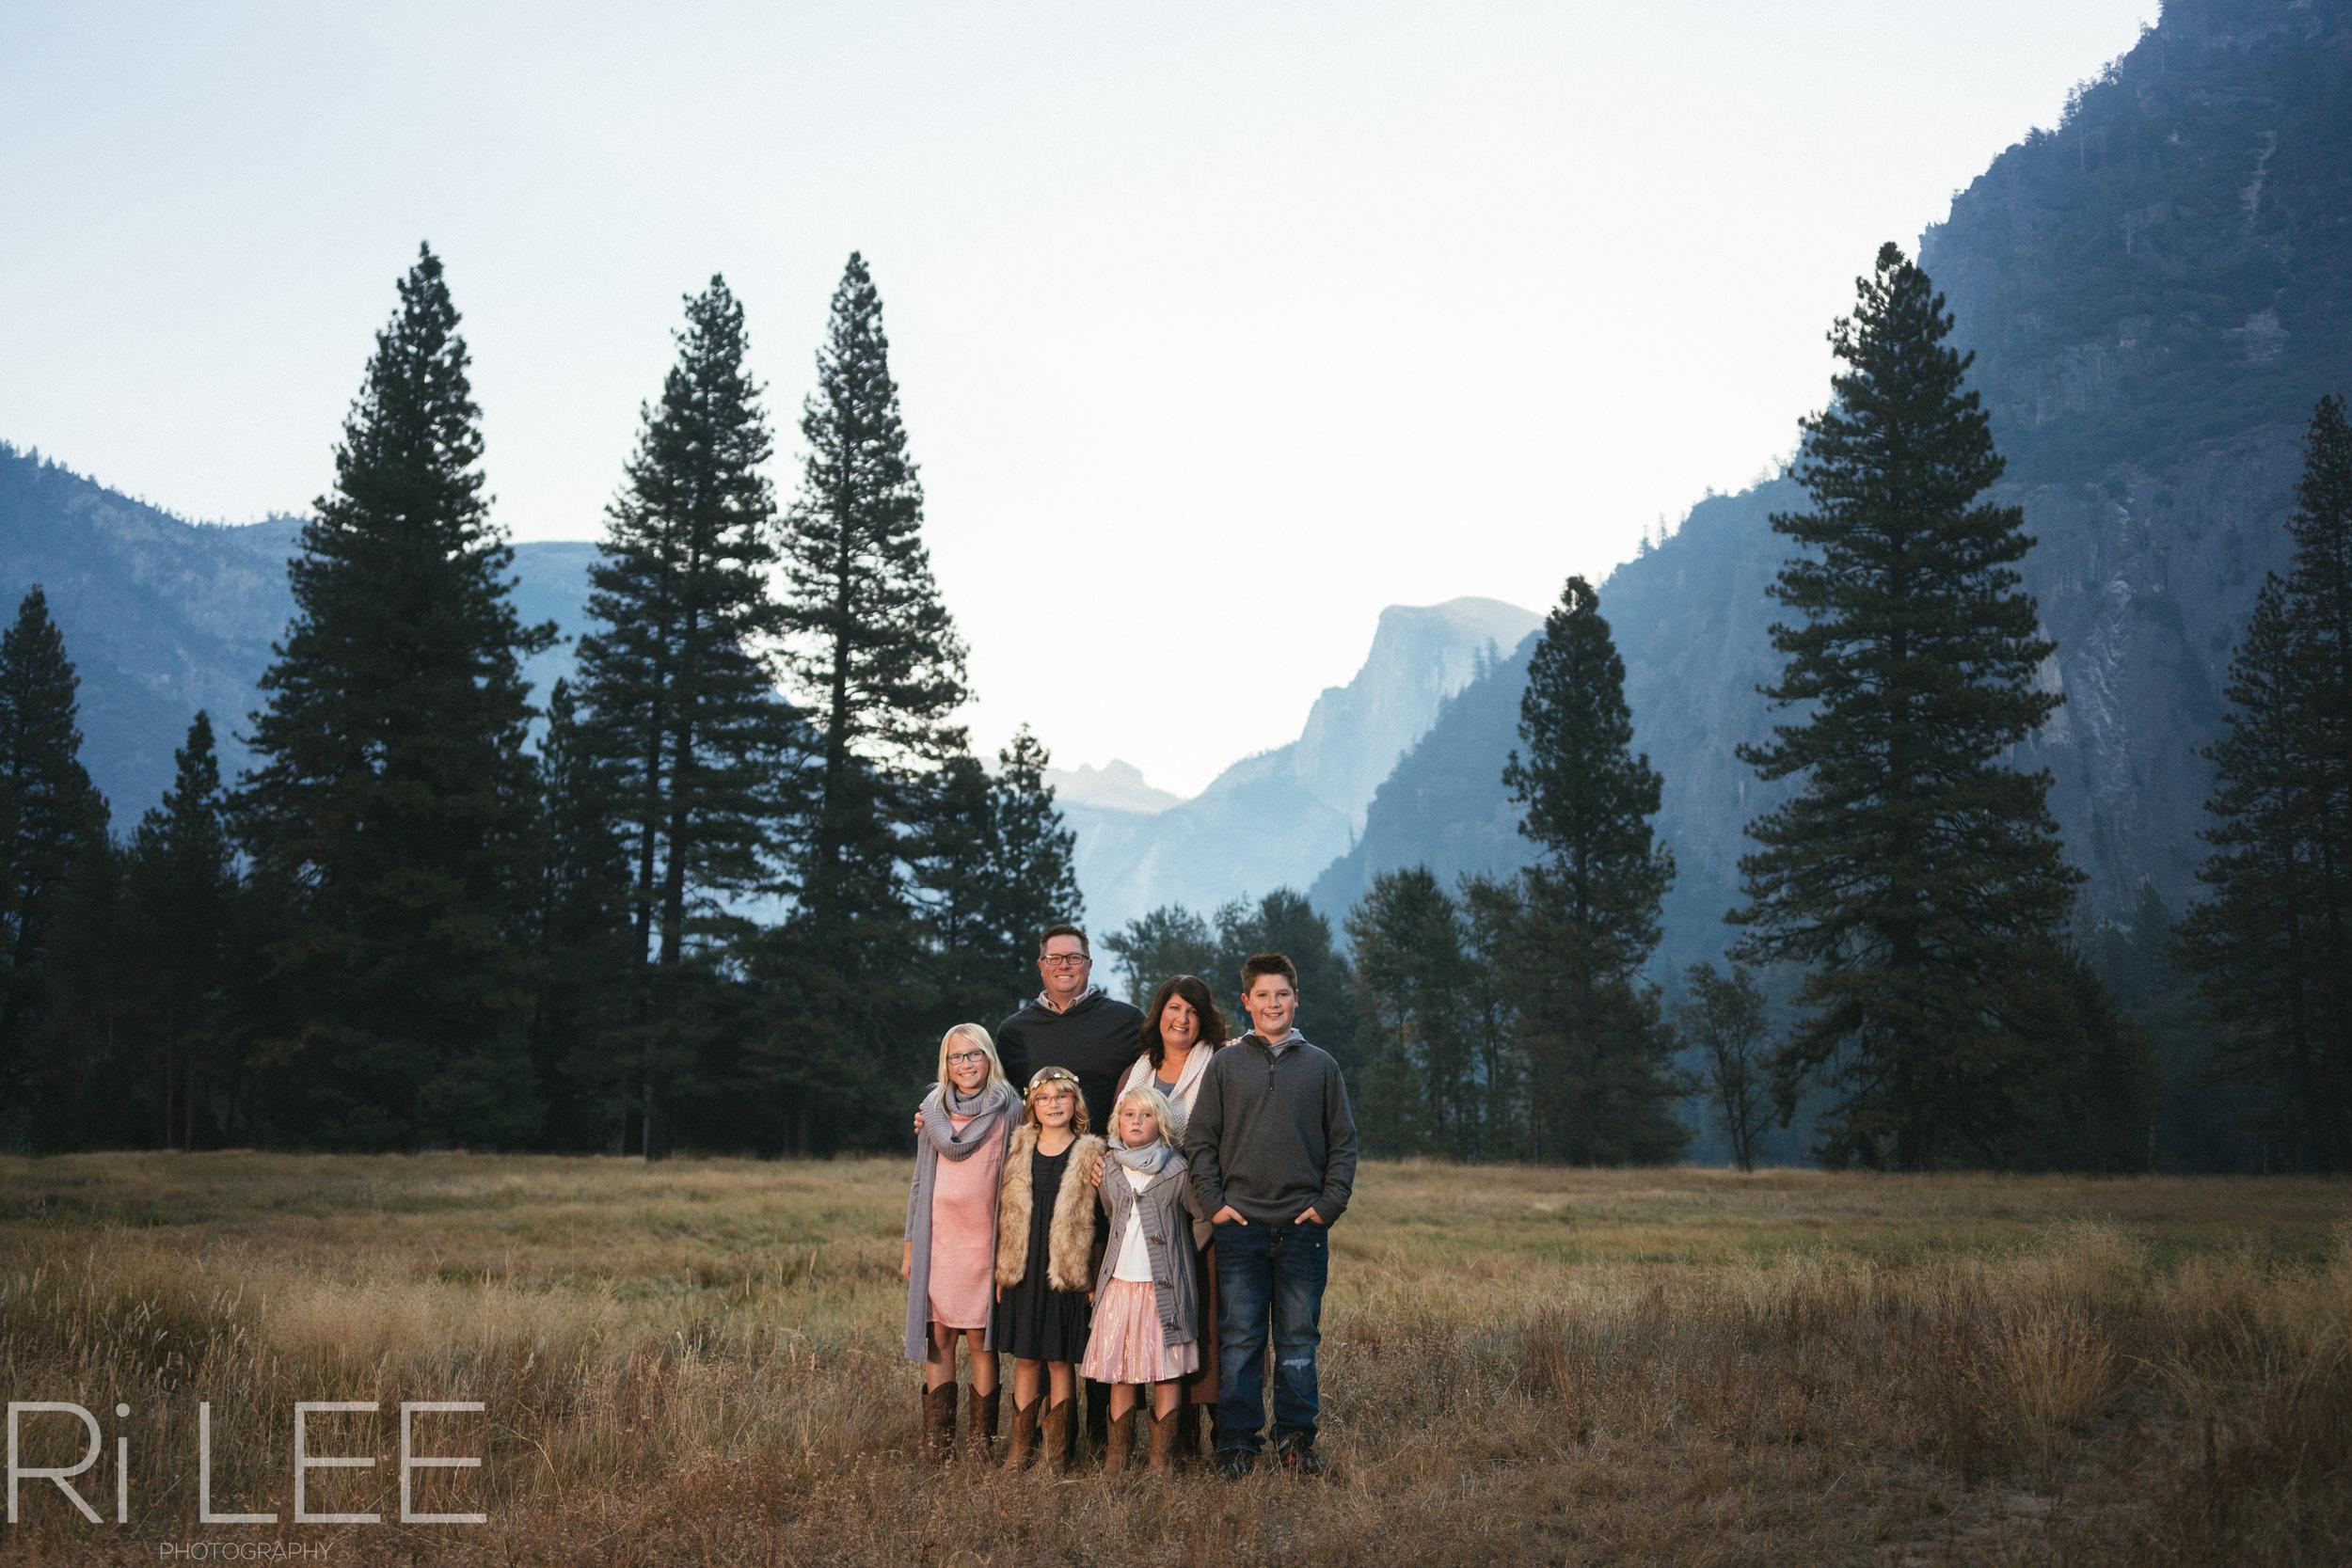 hunt-family-rilee-web (2 of 22).jpg